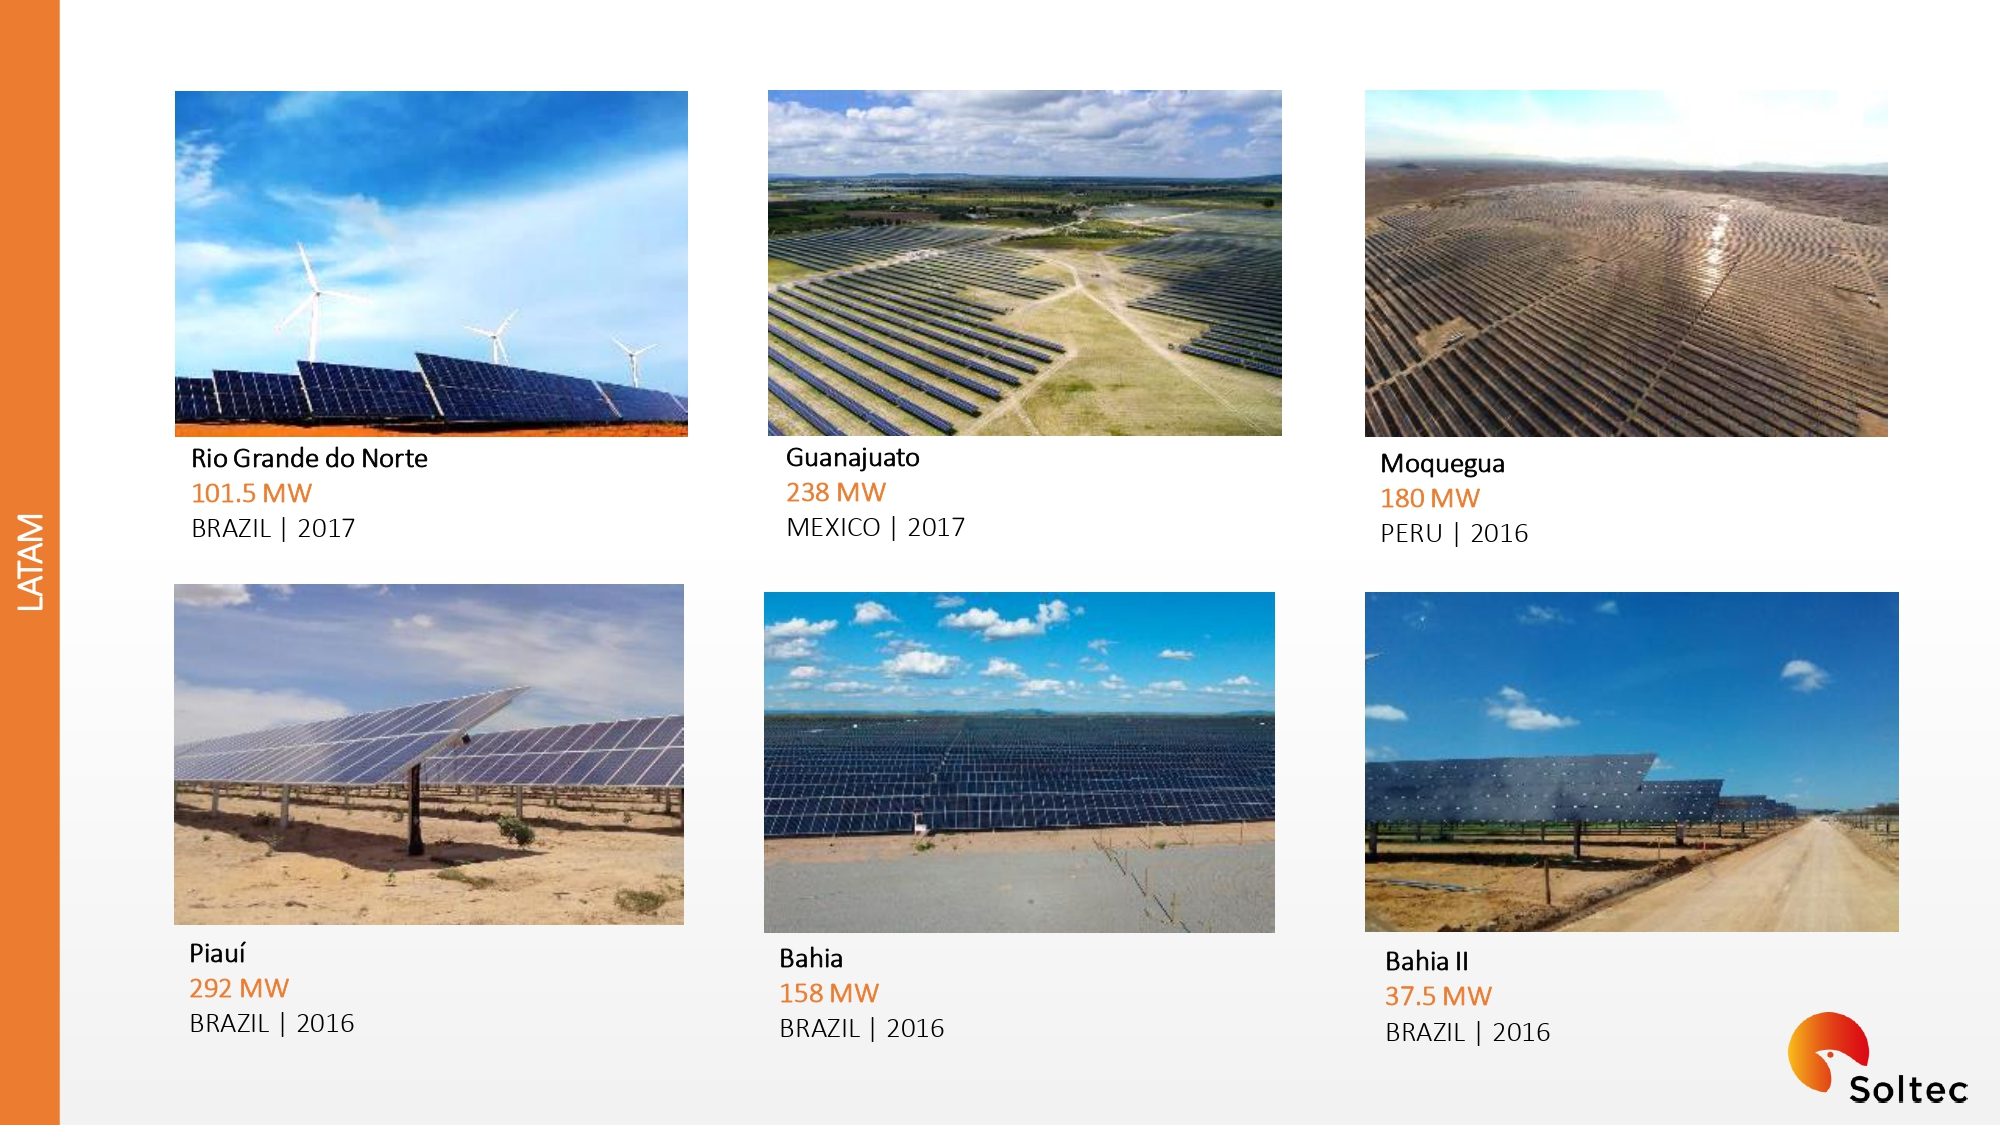 campos solares en distintos países. Transporte realizado por Morarte Logistics.